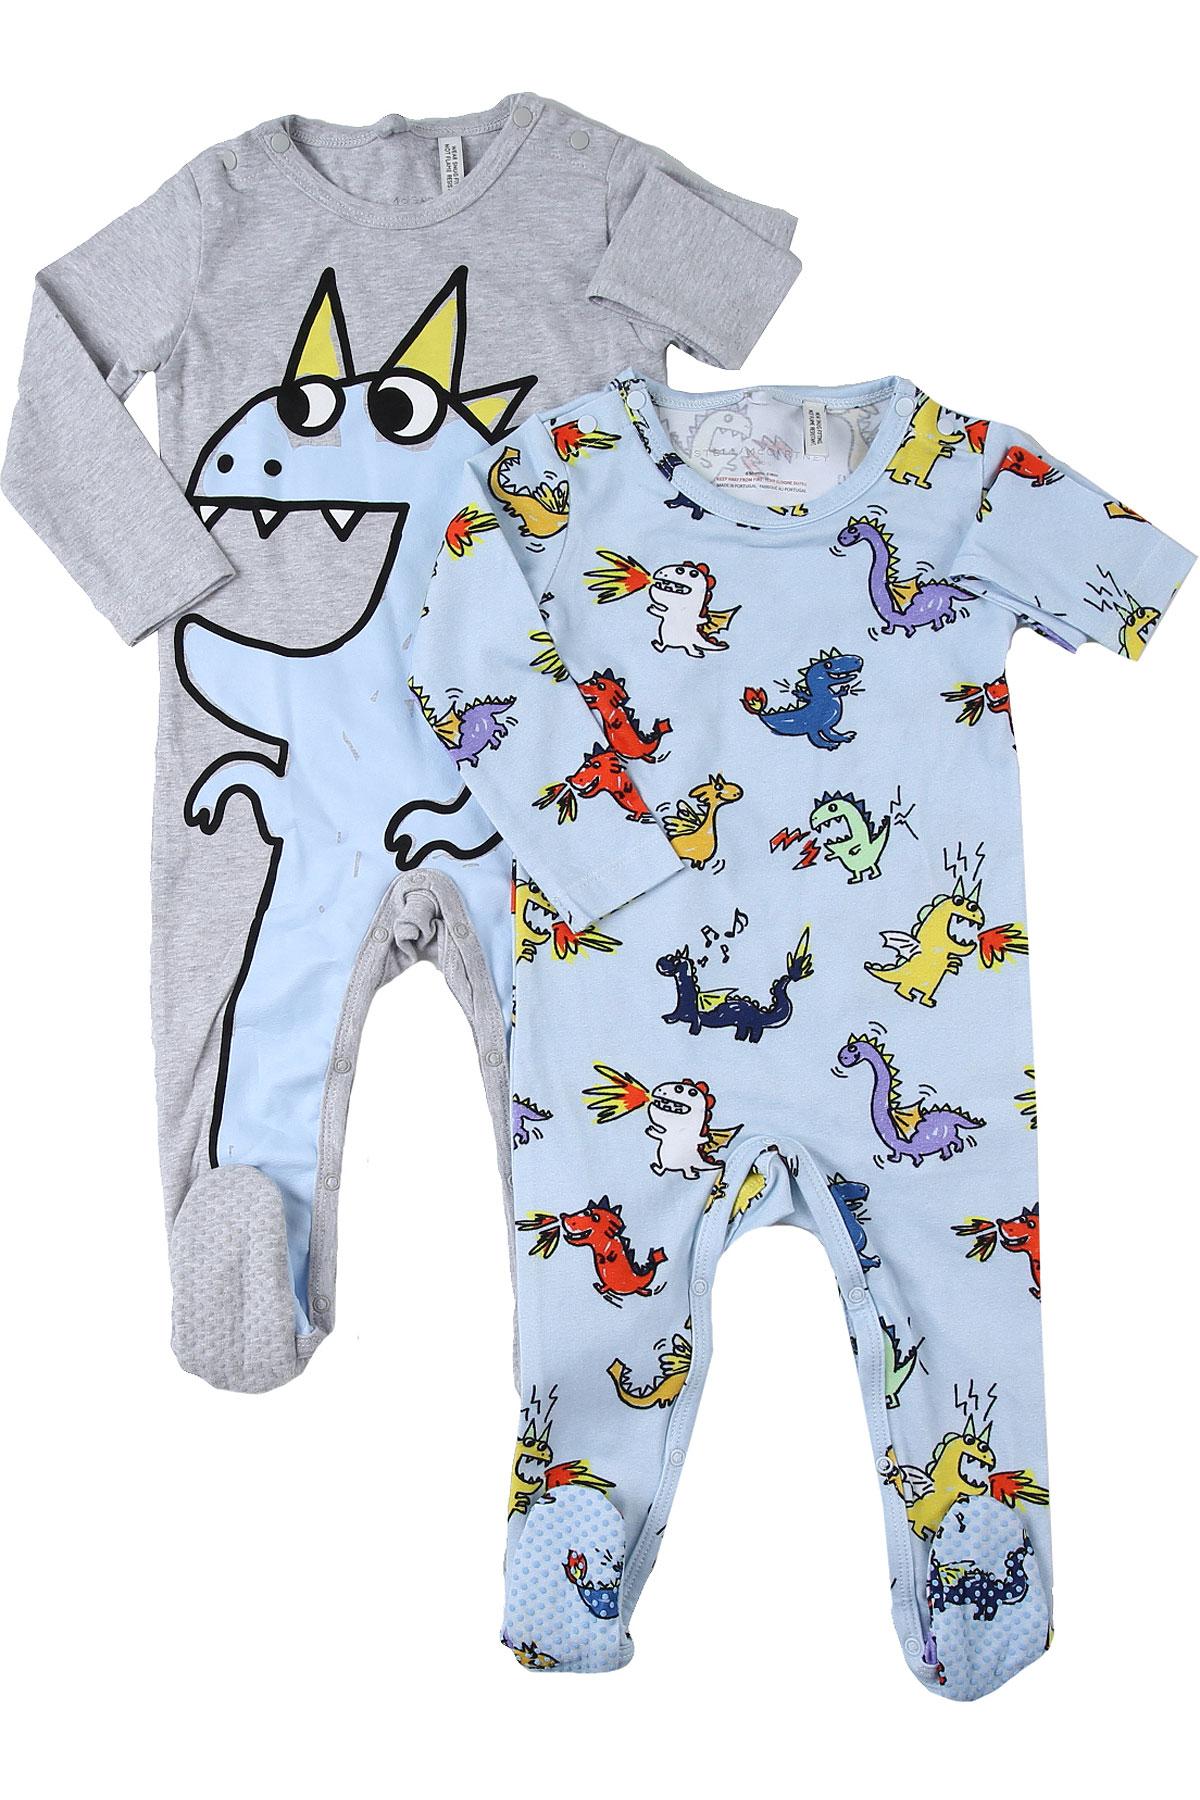 Stella McCartney Baby Bodysuits & Onesies for Boys On Sale, Grey, Cotton, 2019, 3M 6M 9M